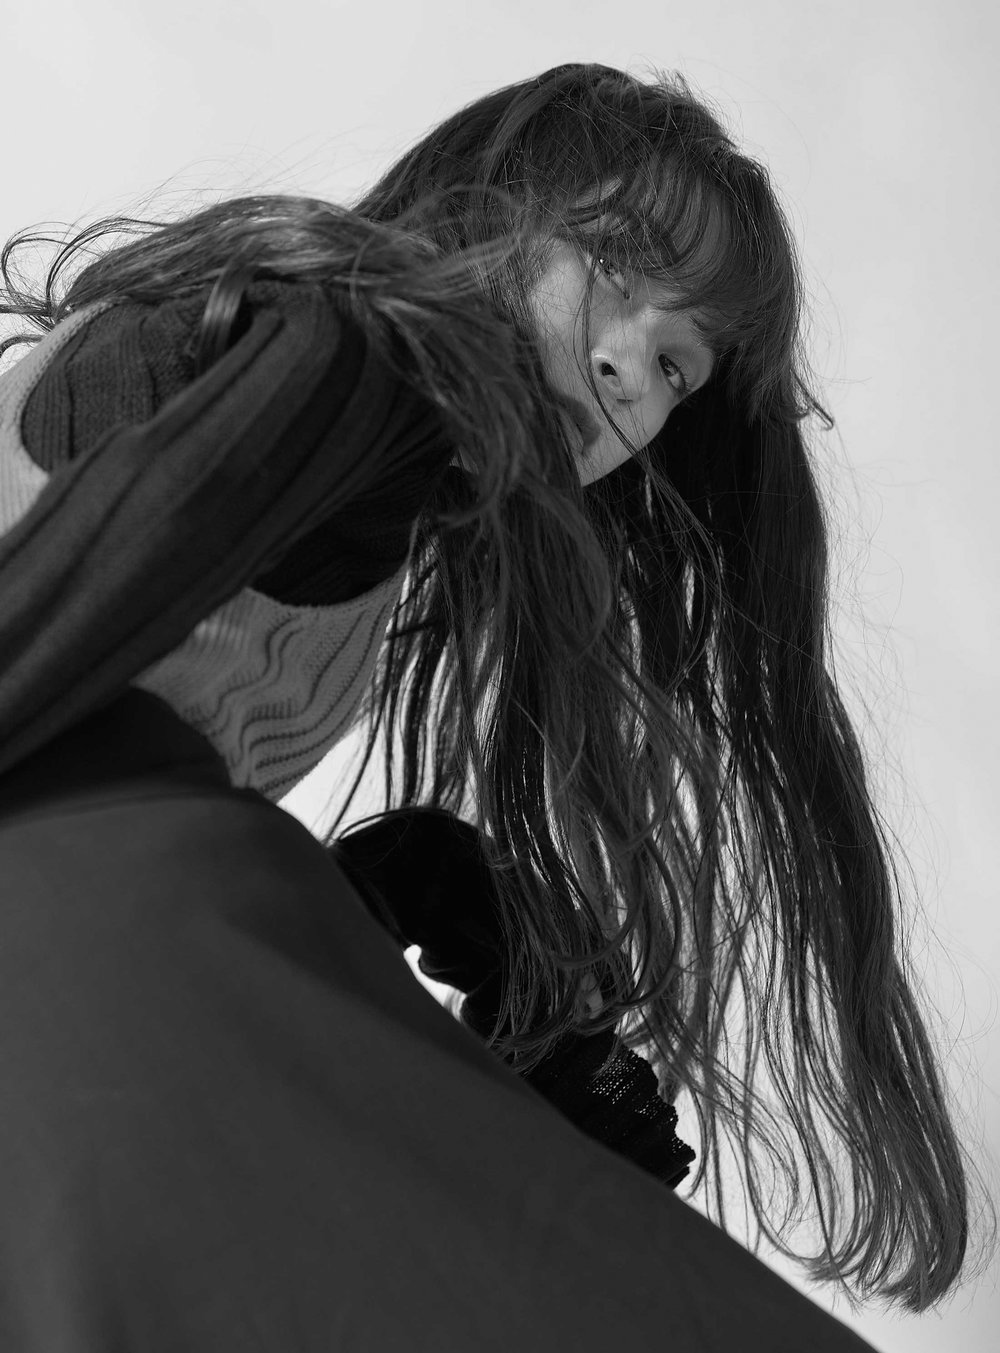 Shaky    Published on 17 December 2018   Photographer  Yuito Ando @yuito_ando  Stylist  Yuuki Sakamoto @stylist_yuuki  Make up & Hair  Honoka Takahashi @honchan57  Model  Raika Yumi at PLATINUM PRODUCTION @YUMI_RAIKA